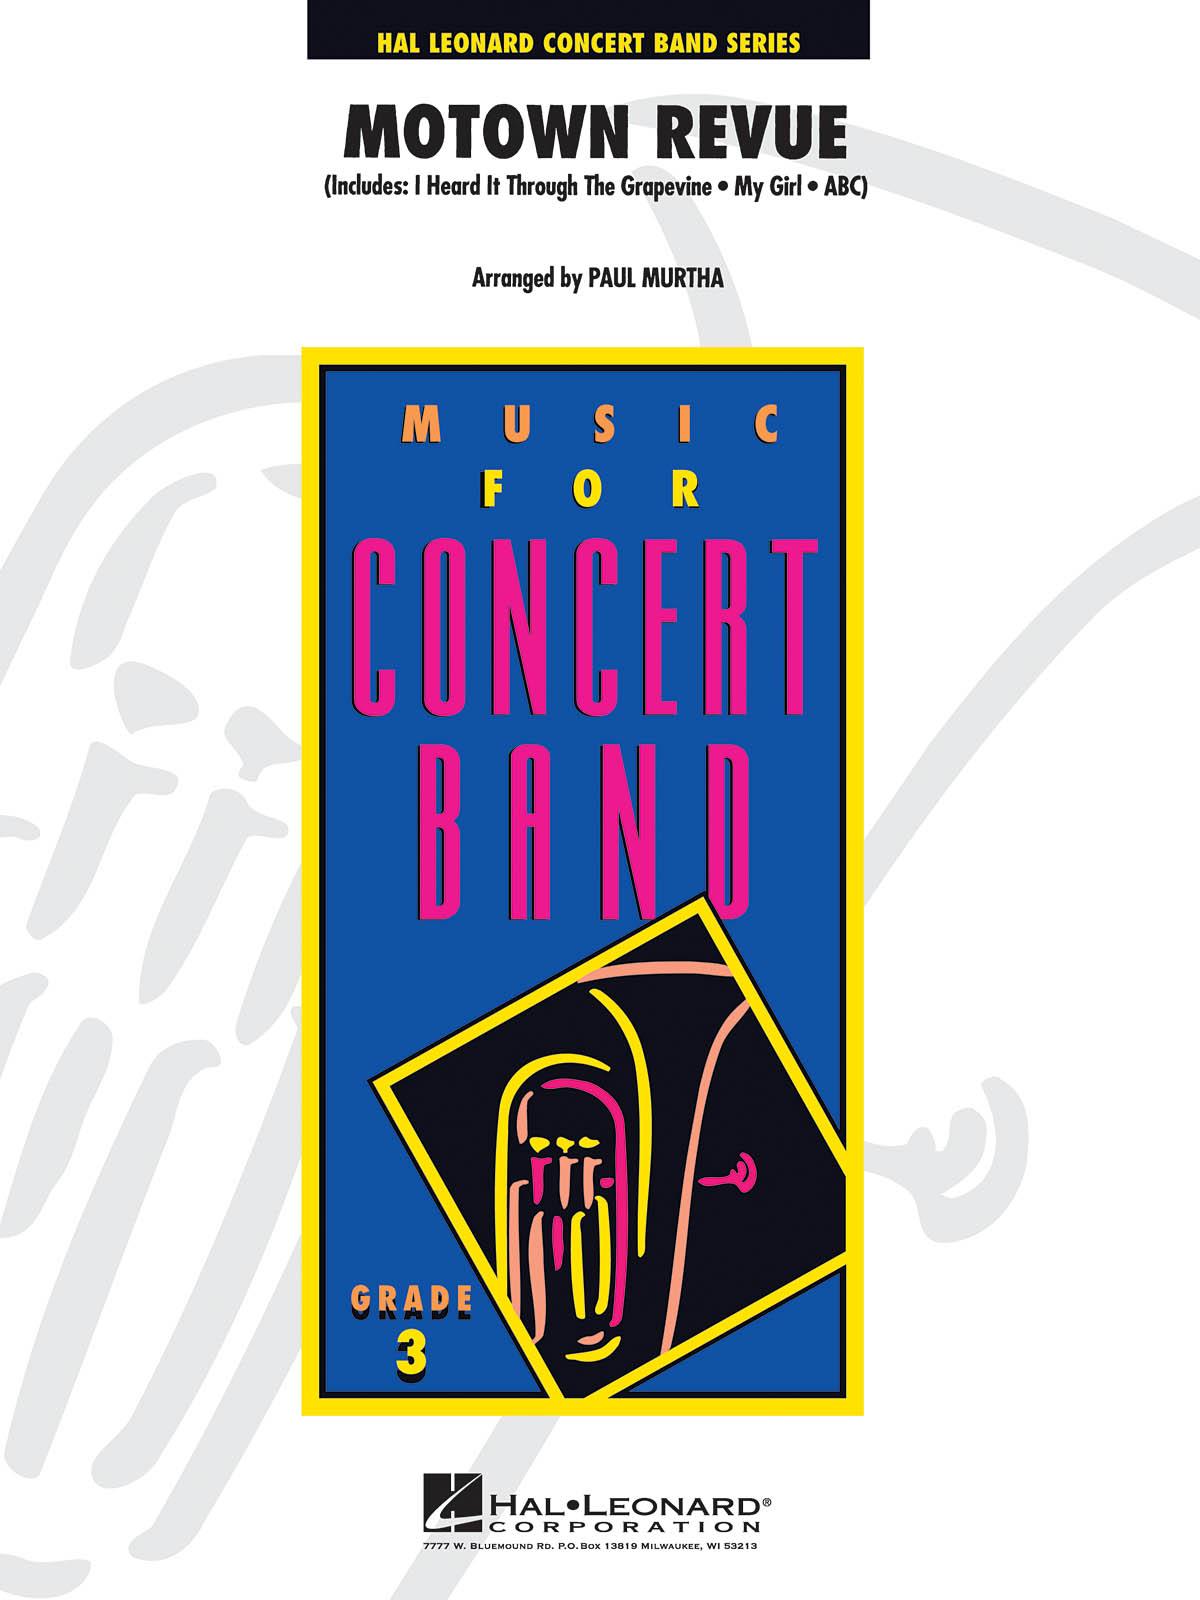 Motown Revue: Concert Band: Score and Parts